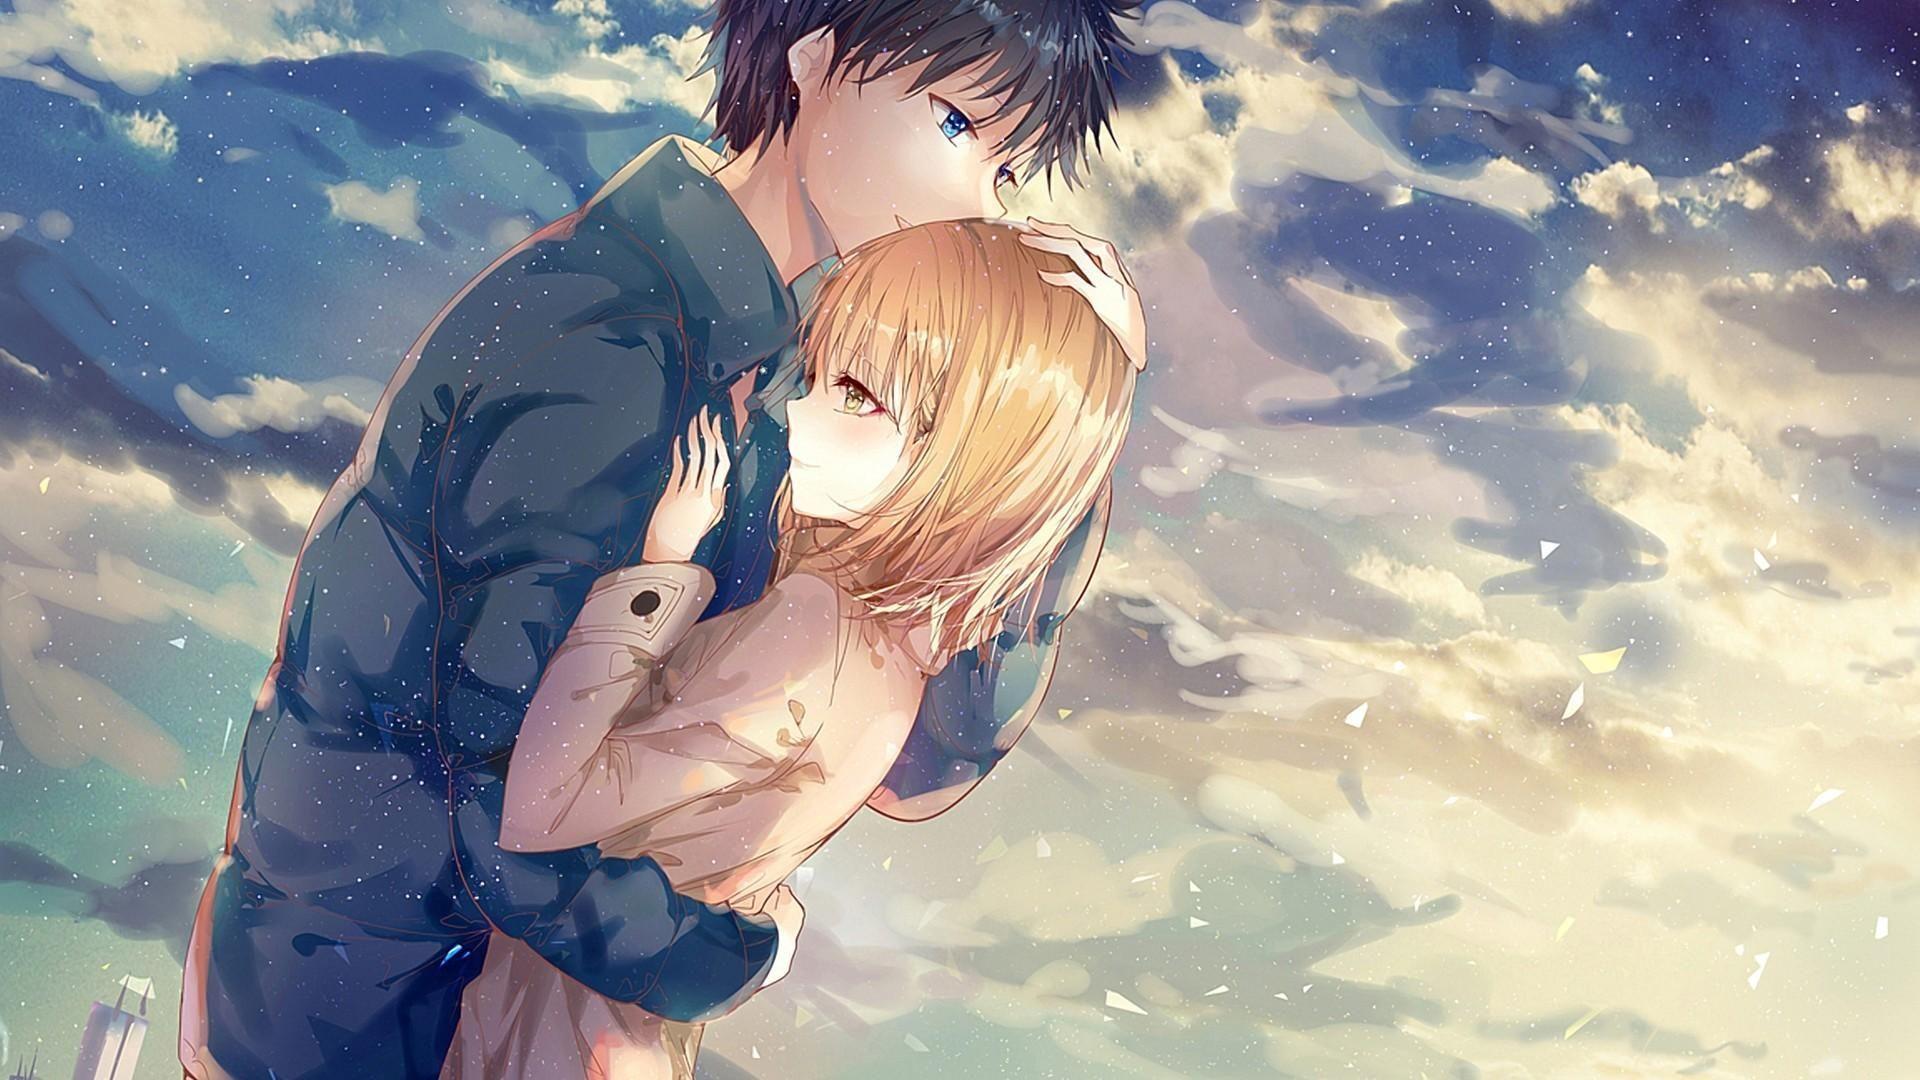 Anime Couple Wallpaper Download Anime Couple Hug Romance Clouds 341307 Tekenen